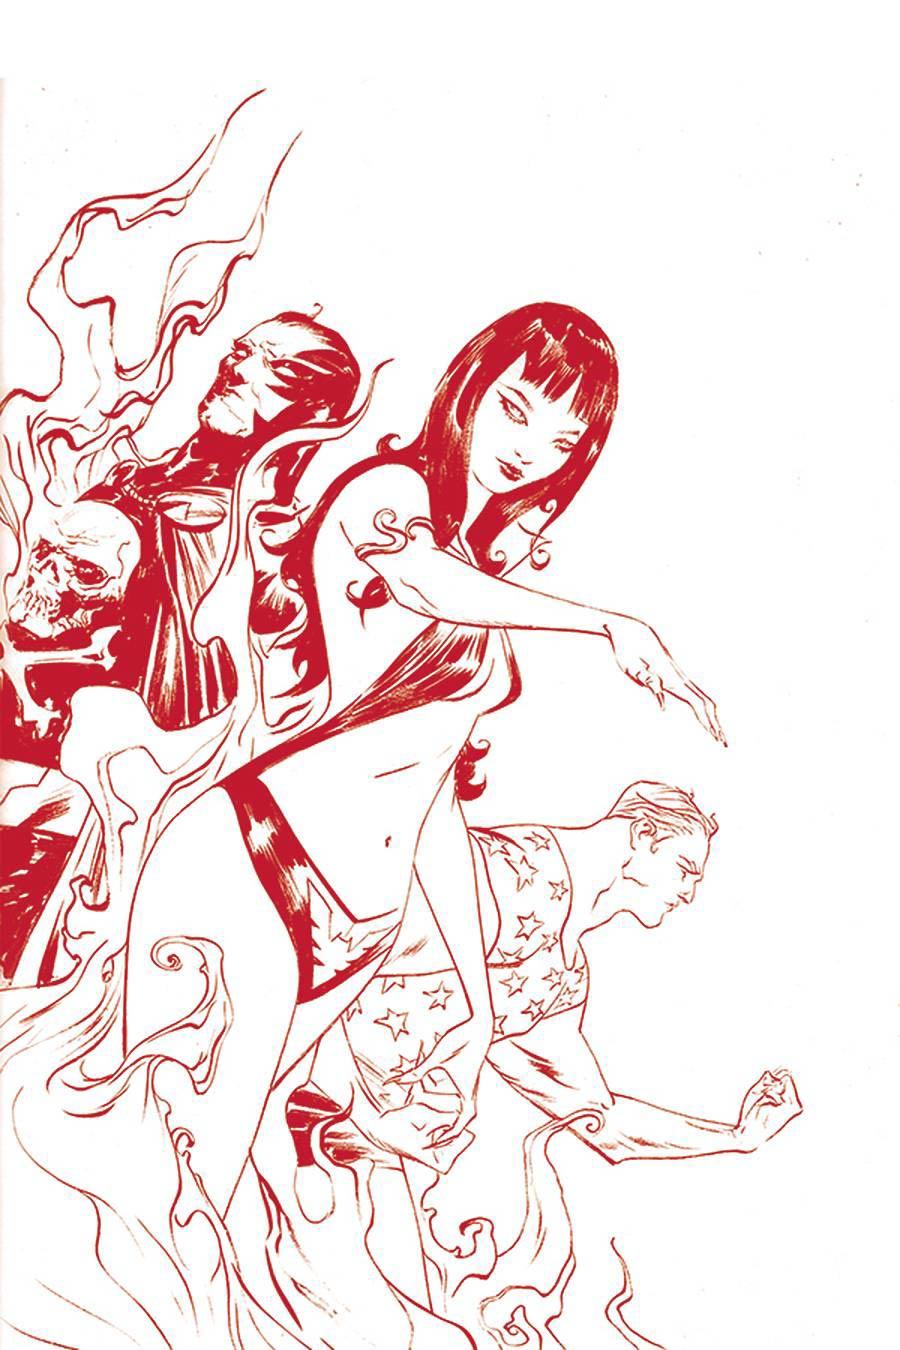 Vampirella The Dark Powers #2 Cover Z Ultra-Premium Limited Edition Jae Lee Crimson Red Line Art Virgin Cover